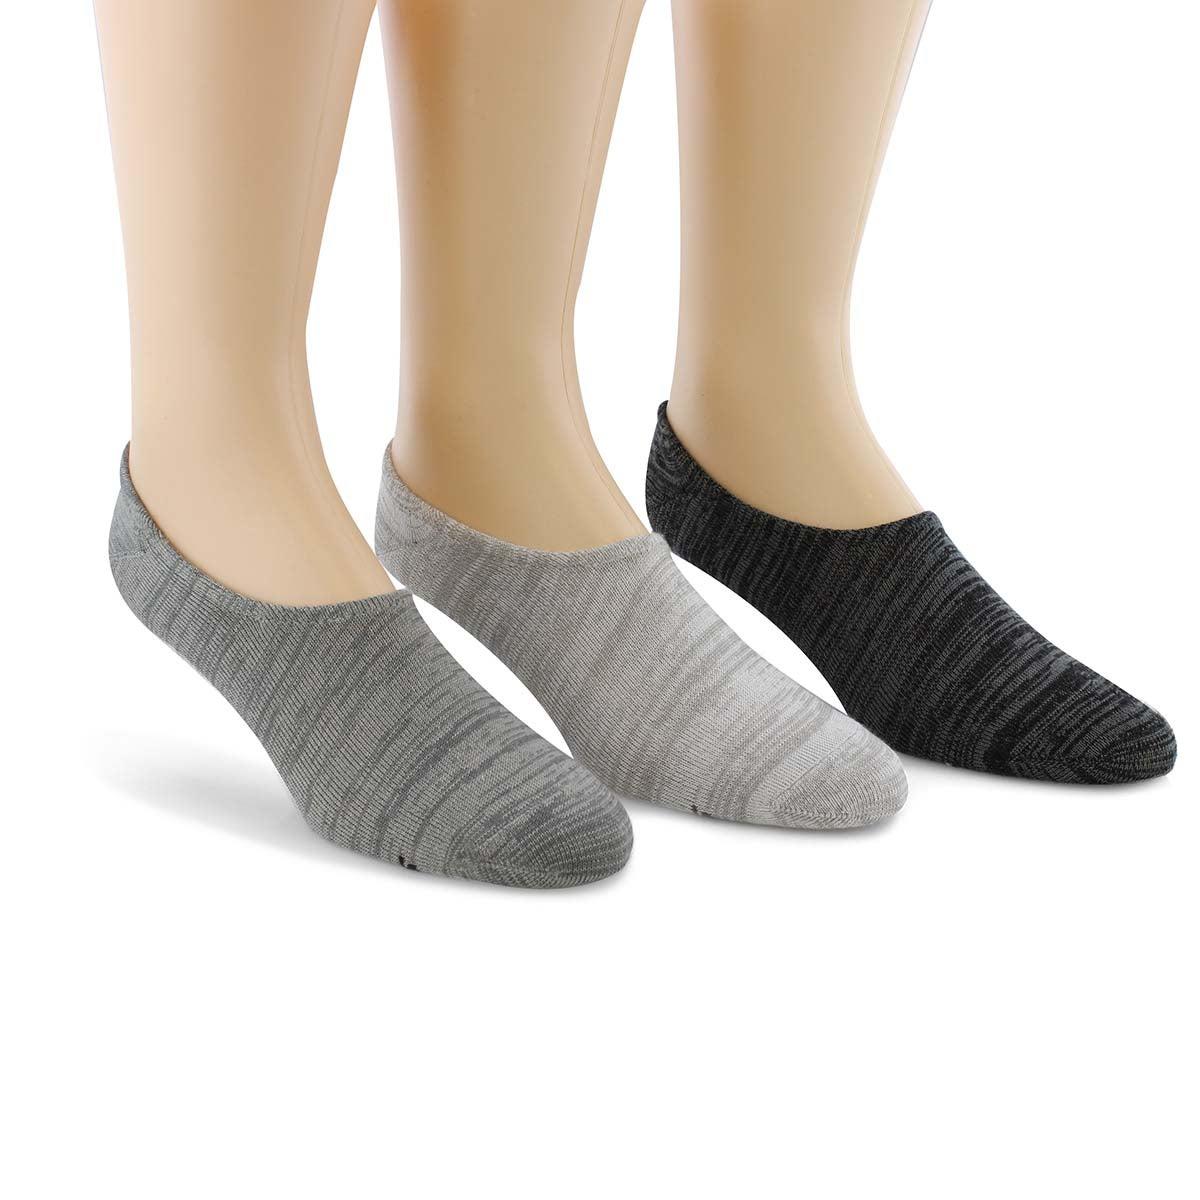 Mns Non Terry No Show gry mlti socks 3pk